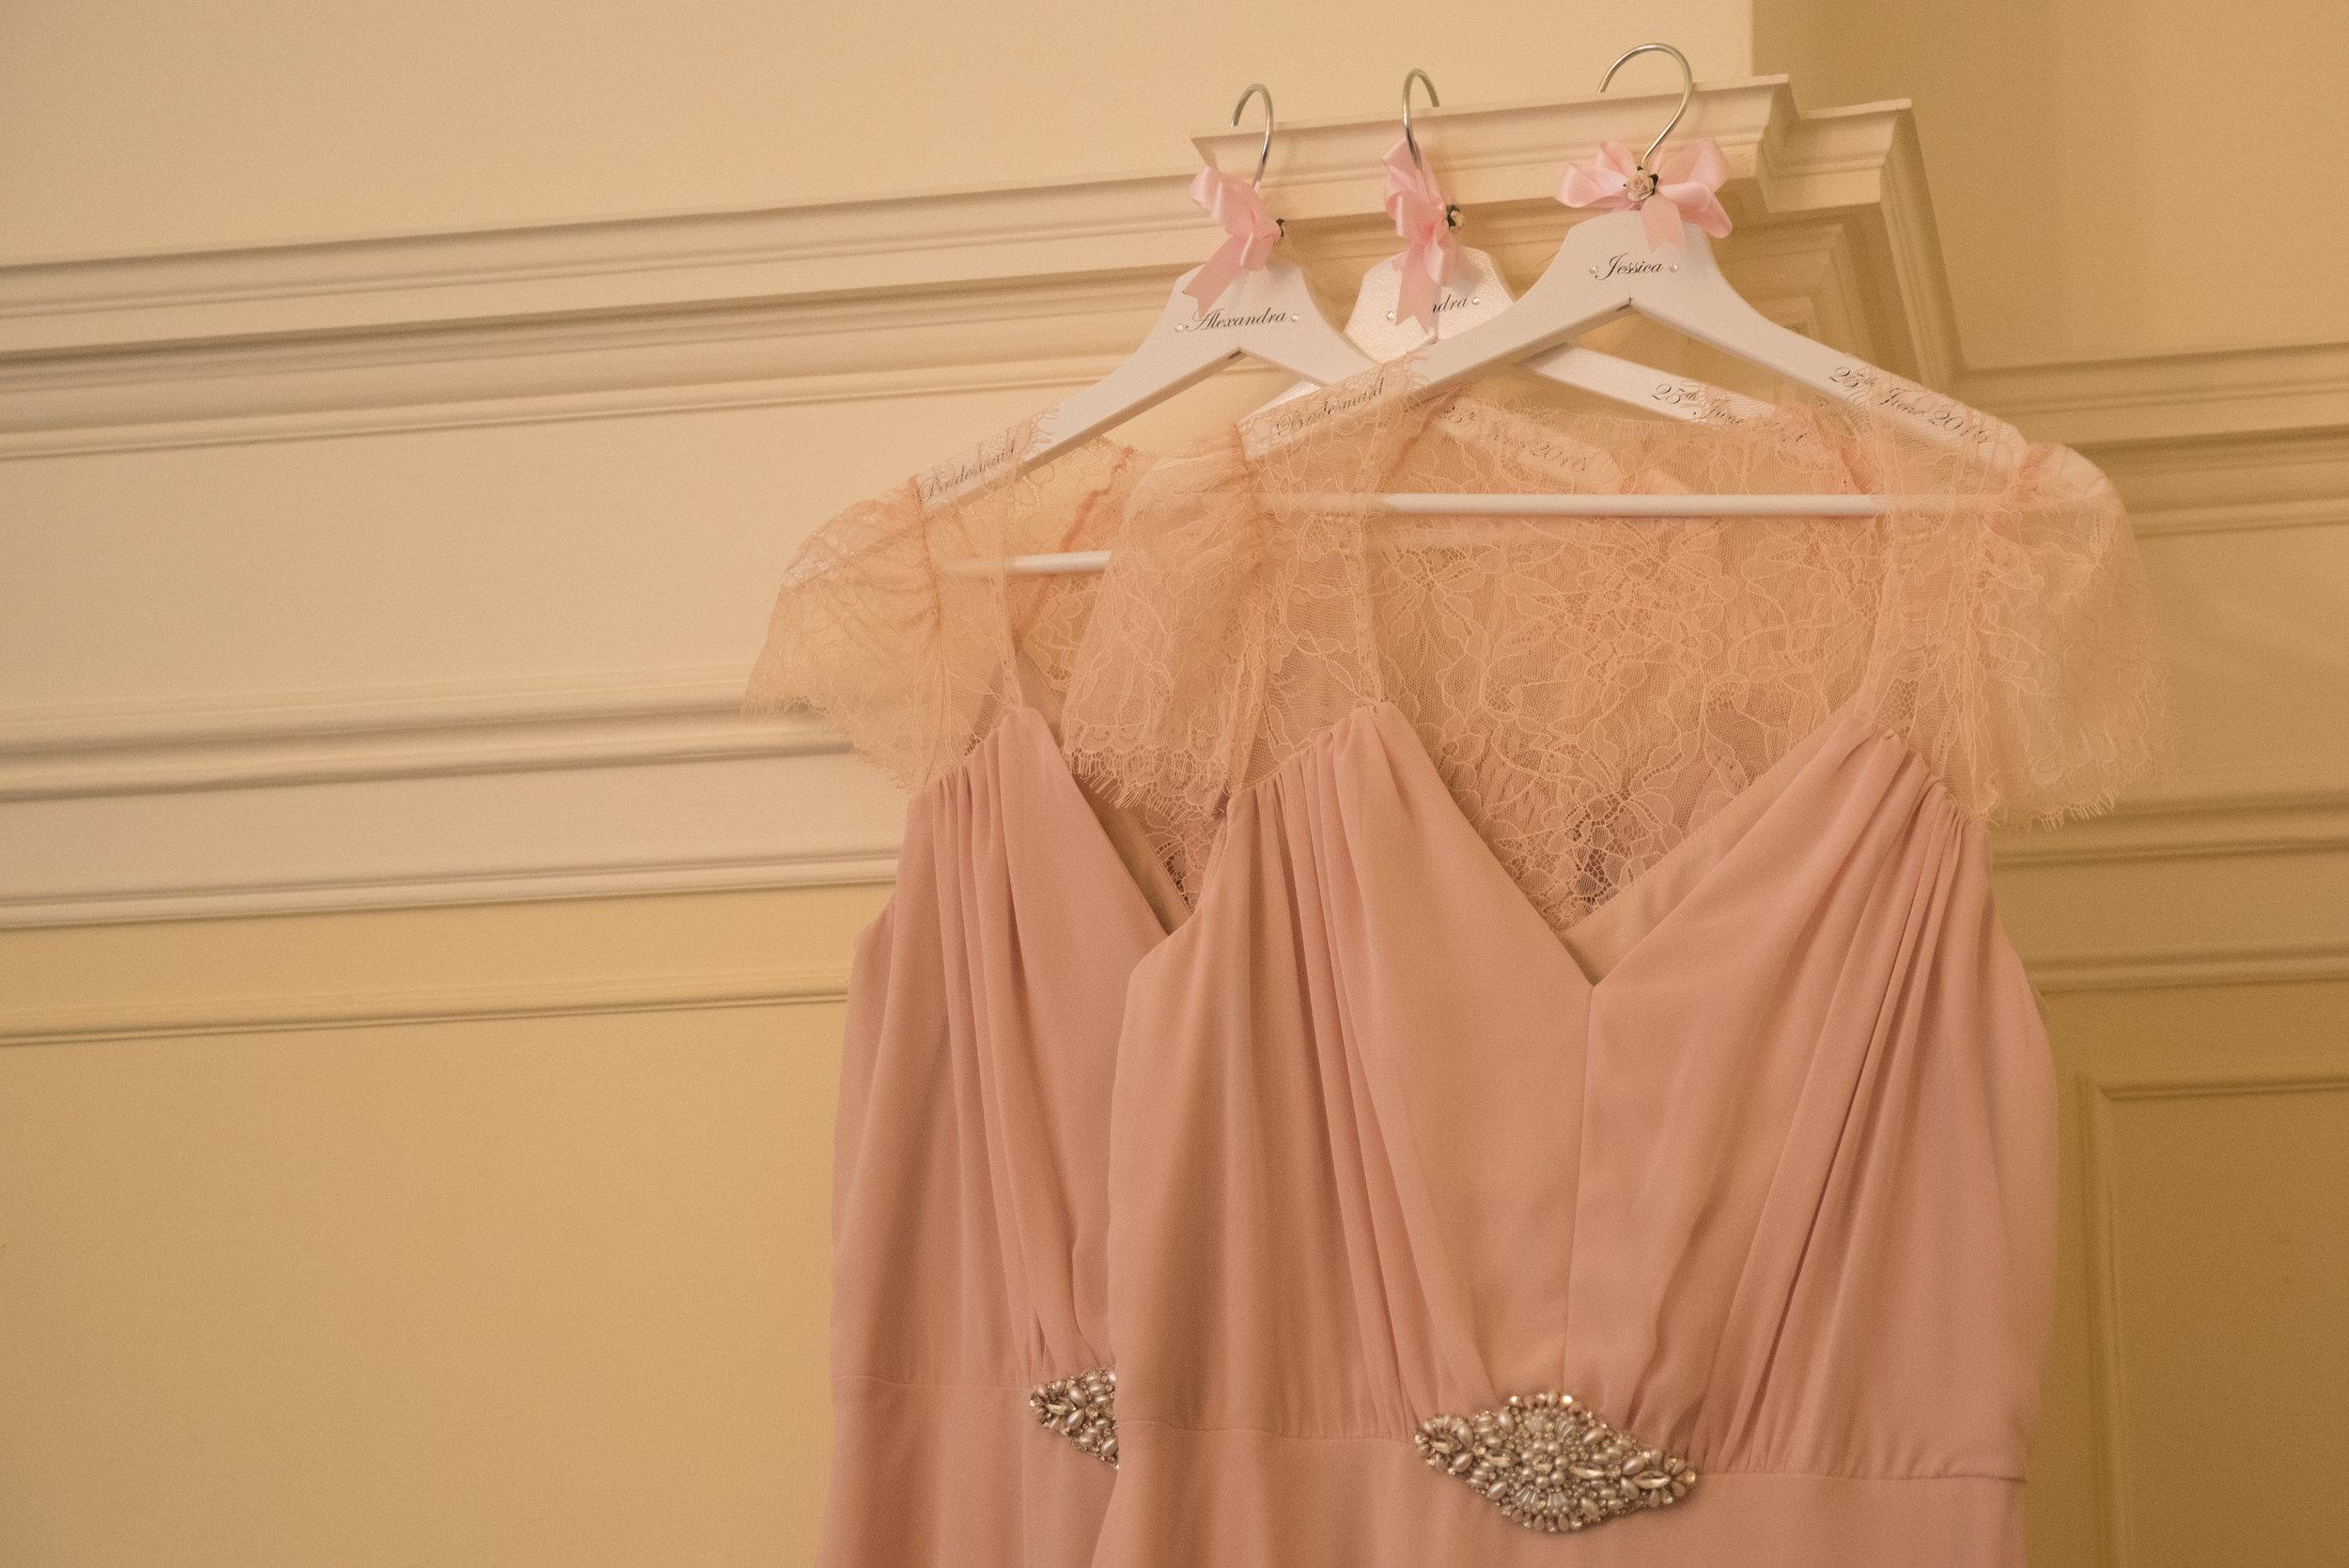 designer bridesmaids dress, Danesfield House wedding, Danesfield House wedding photographer, Danesfield House wedding photography